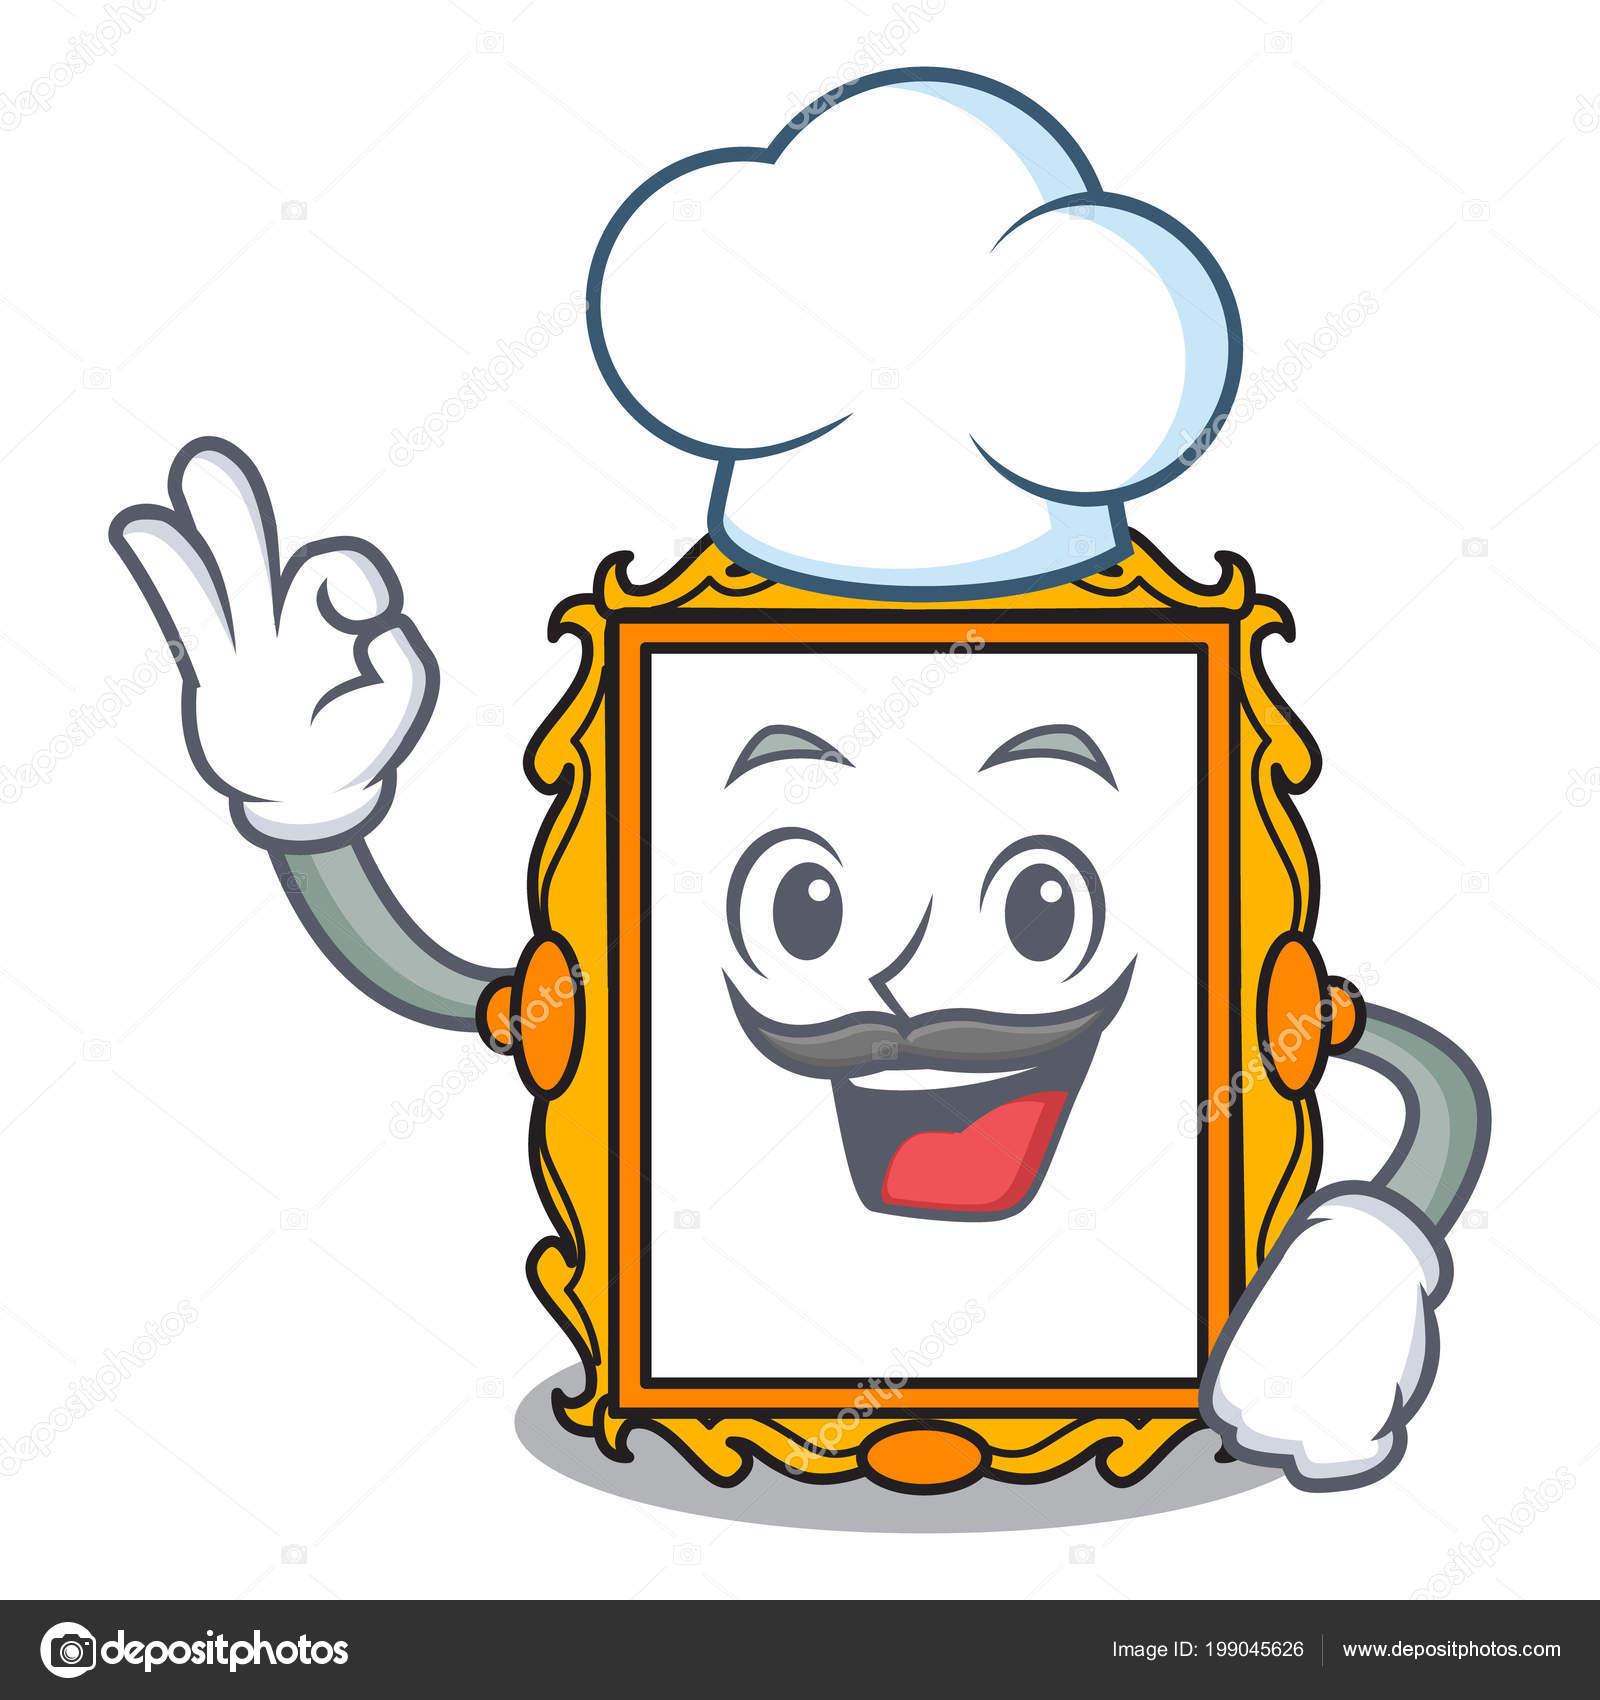 Ilustración Vector Dibujos Animados Chef Cuadro Marco Carácter ...